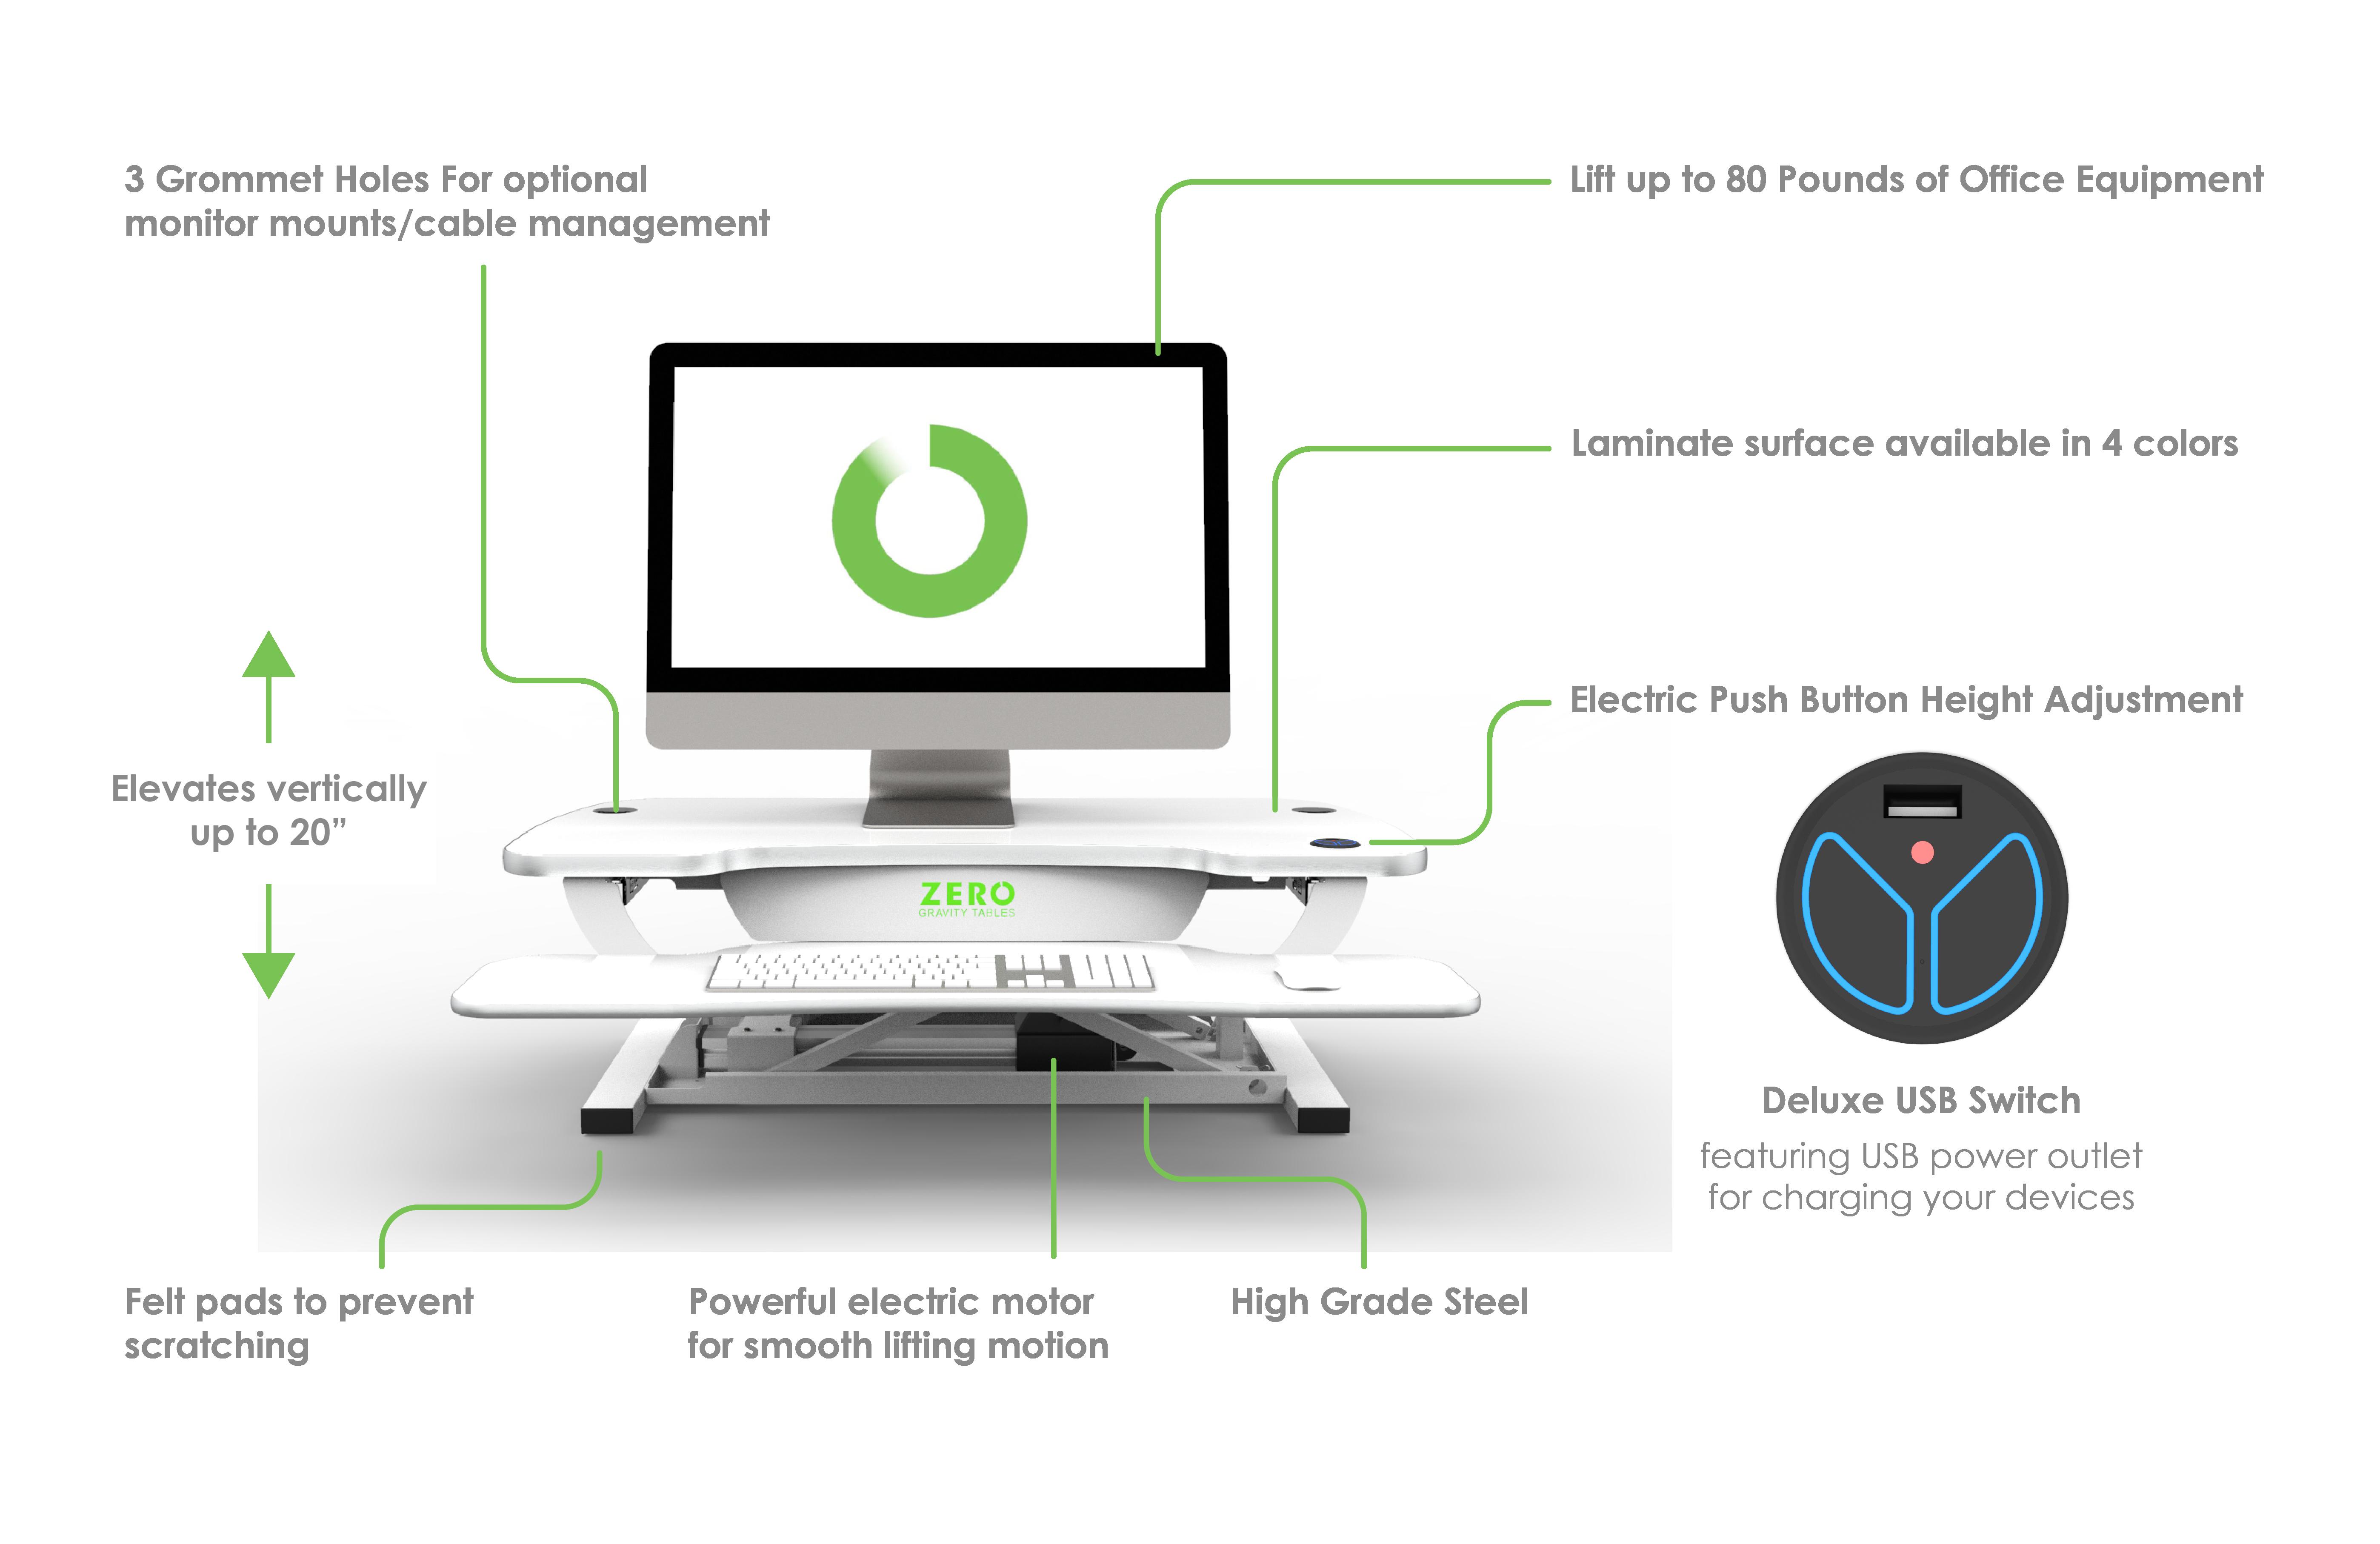 zero-gravity-desktop-riser-features-usb-switch-.png